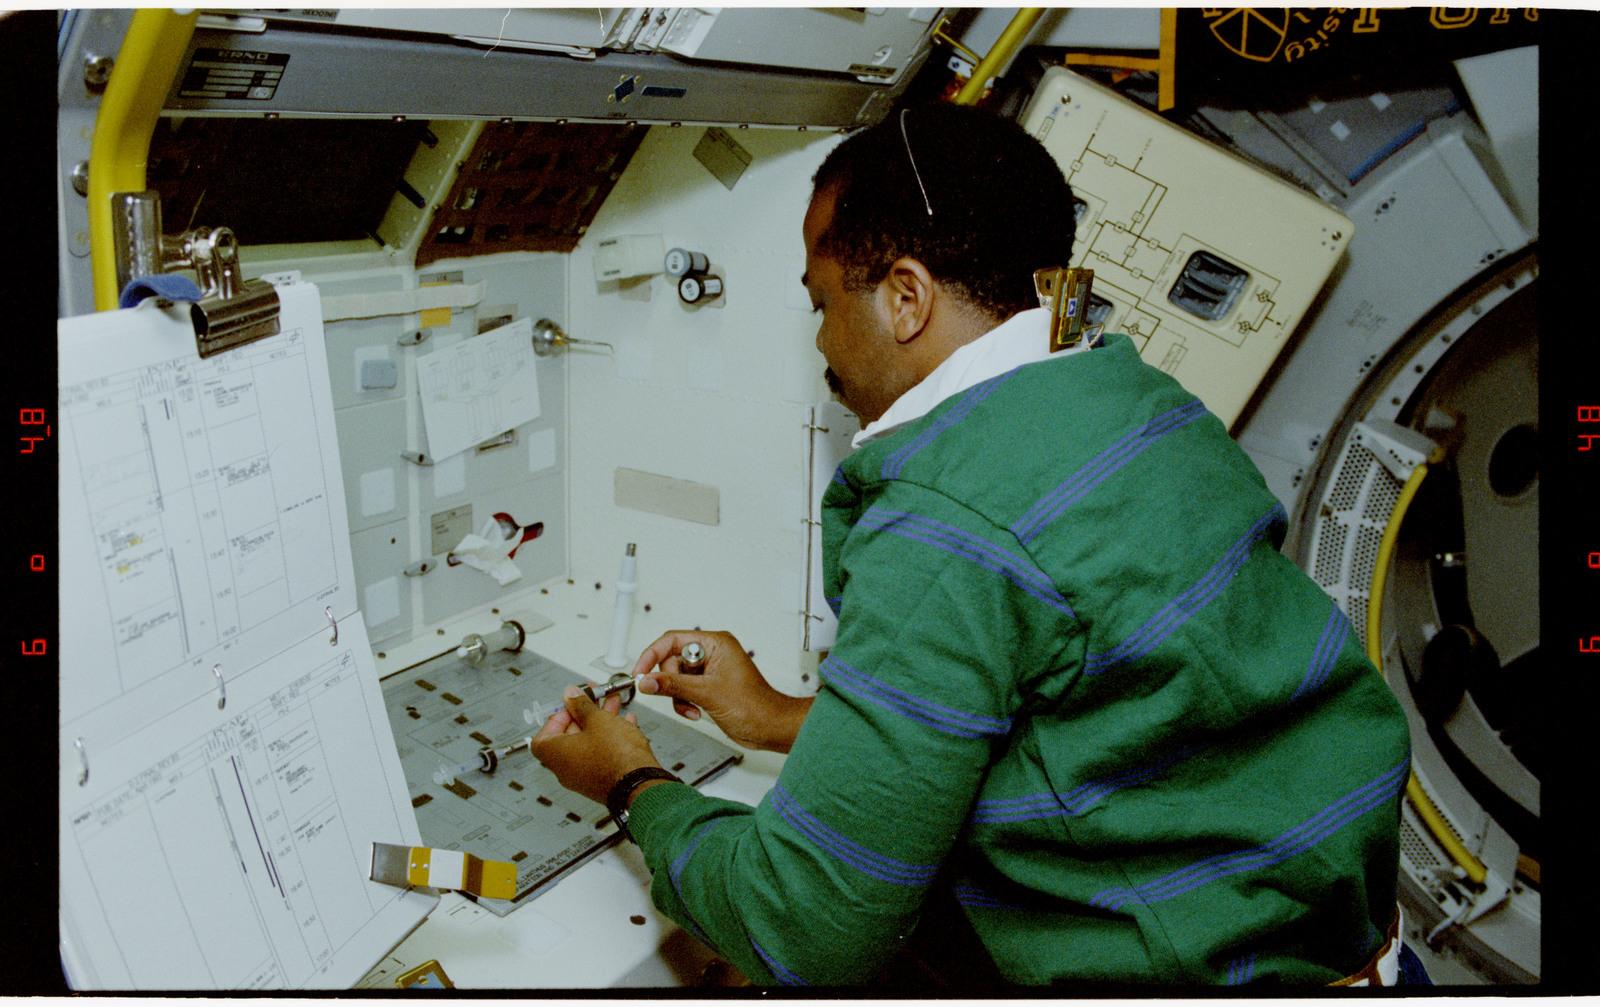 STS055-23-015 - STS-055 - Crewmember at Work Preparing Syringes in the D-2 Spacelab